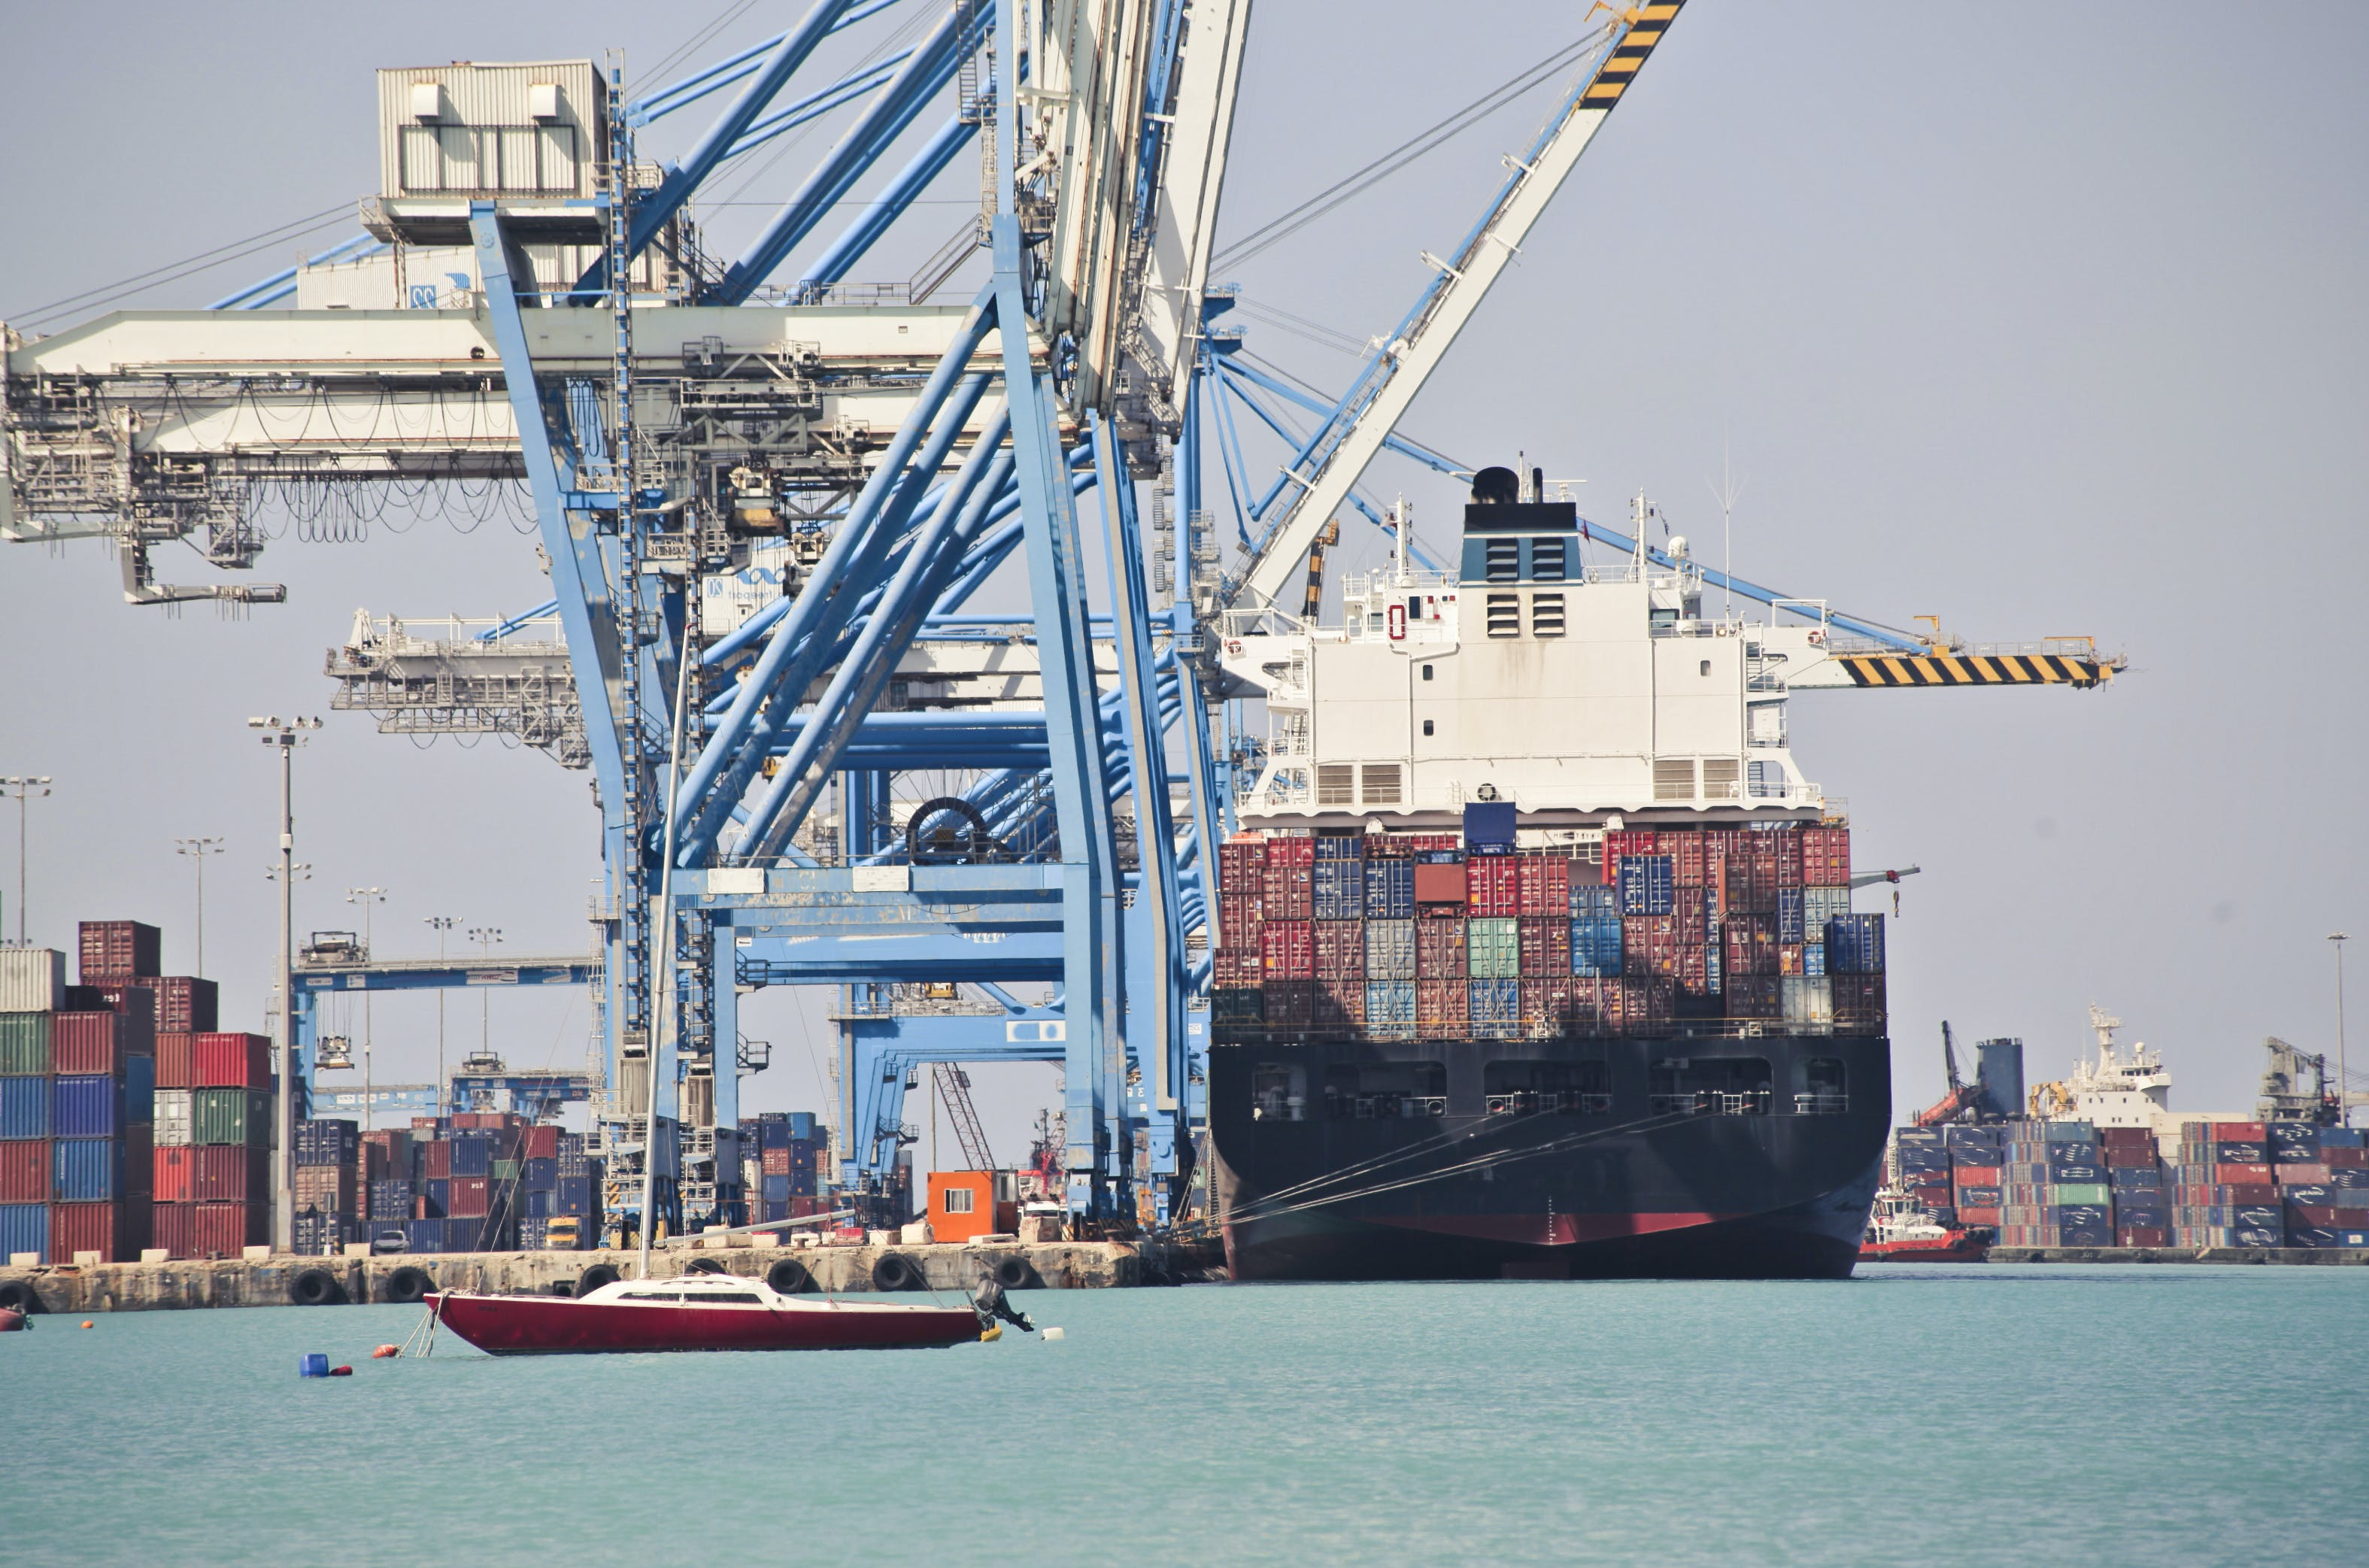 boat, cargo, cargo freight